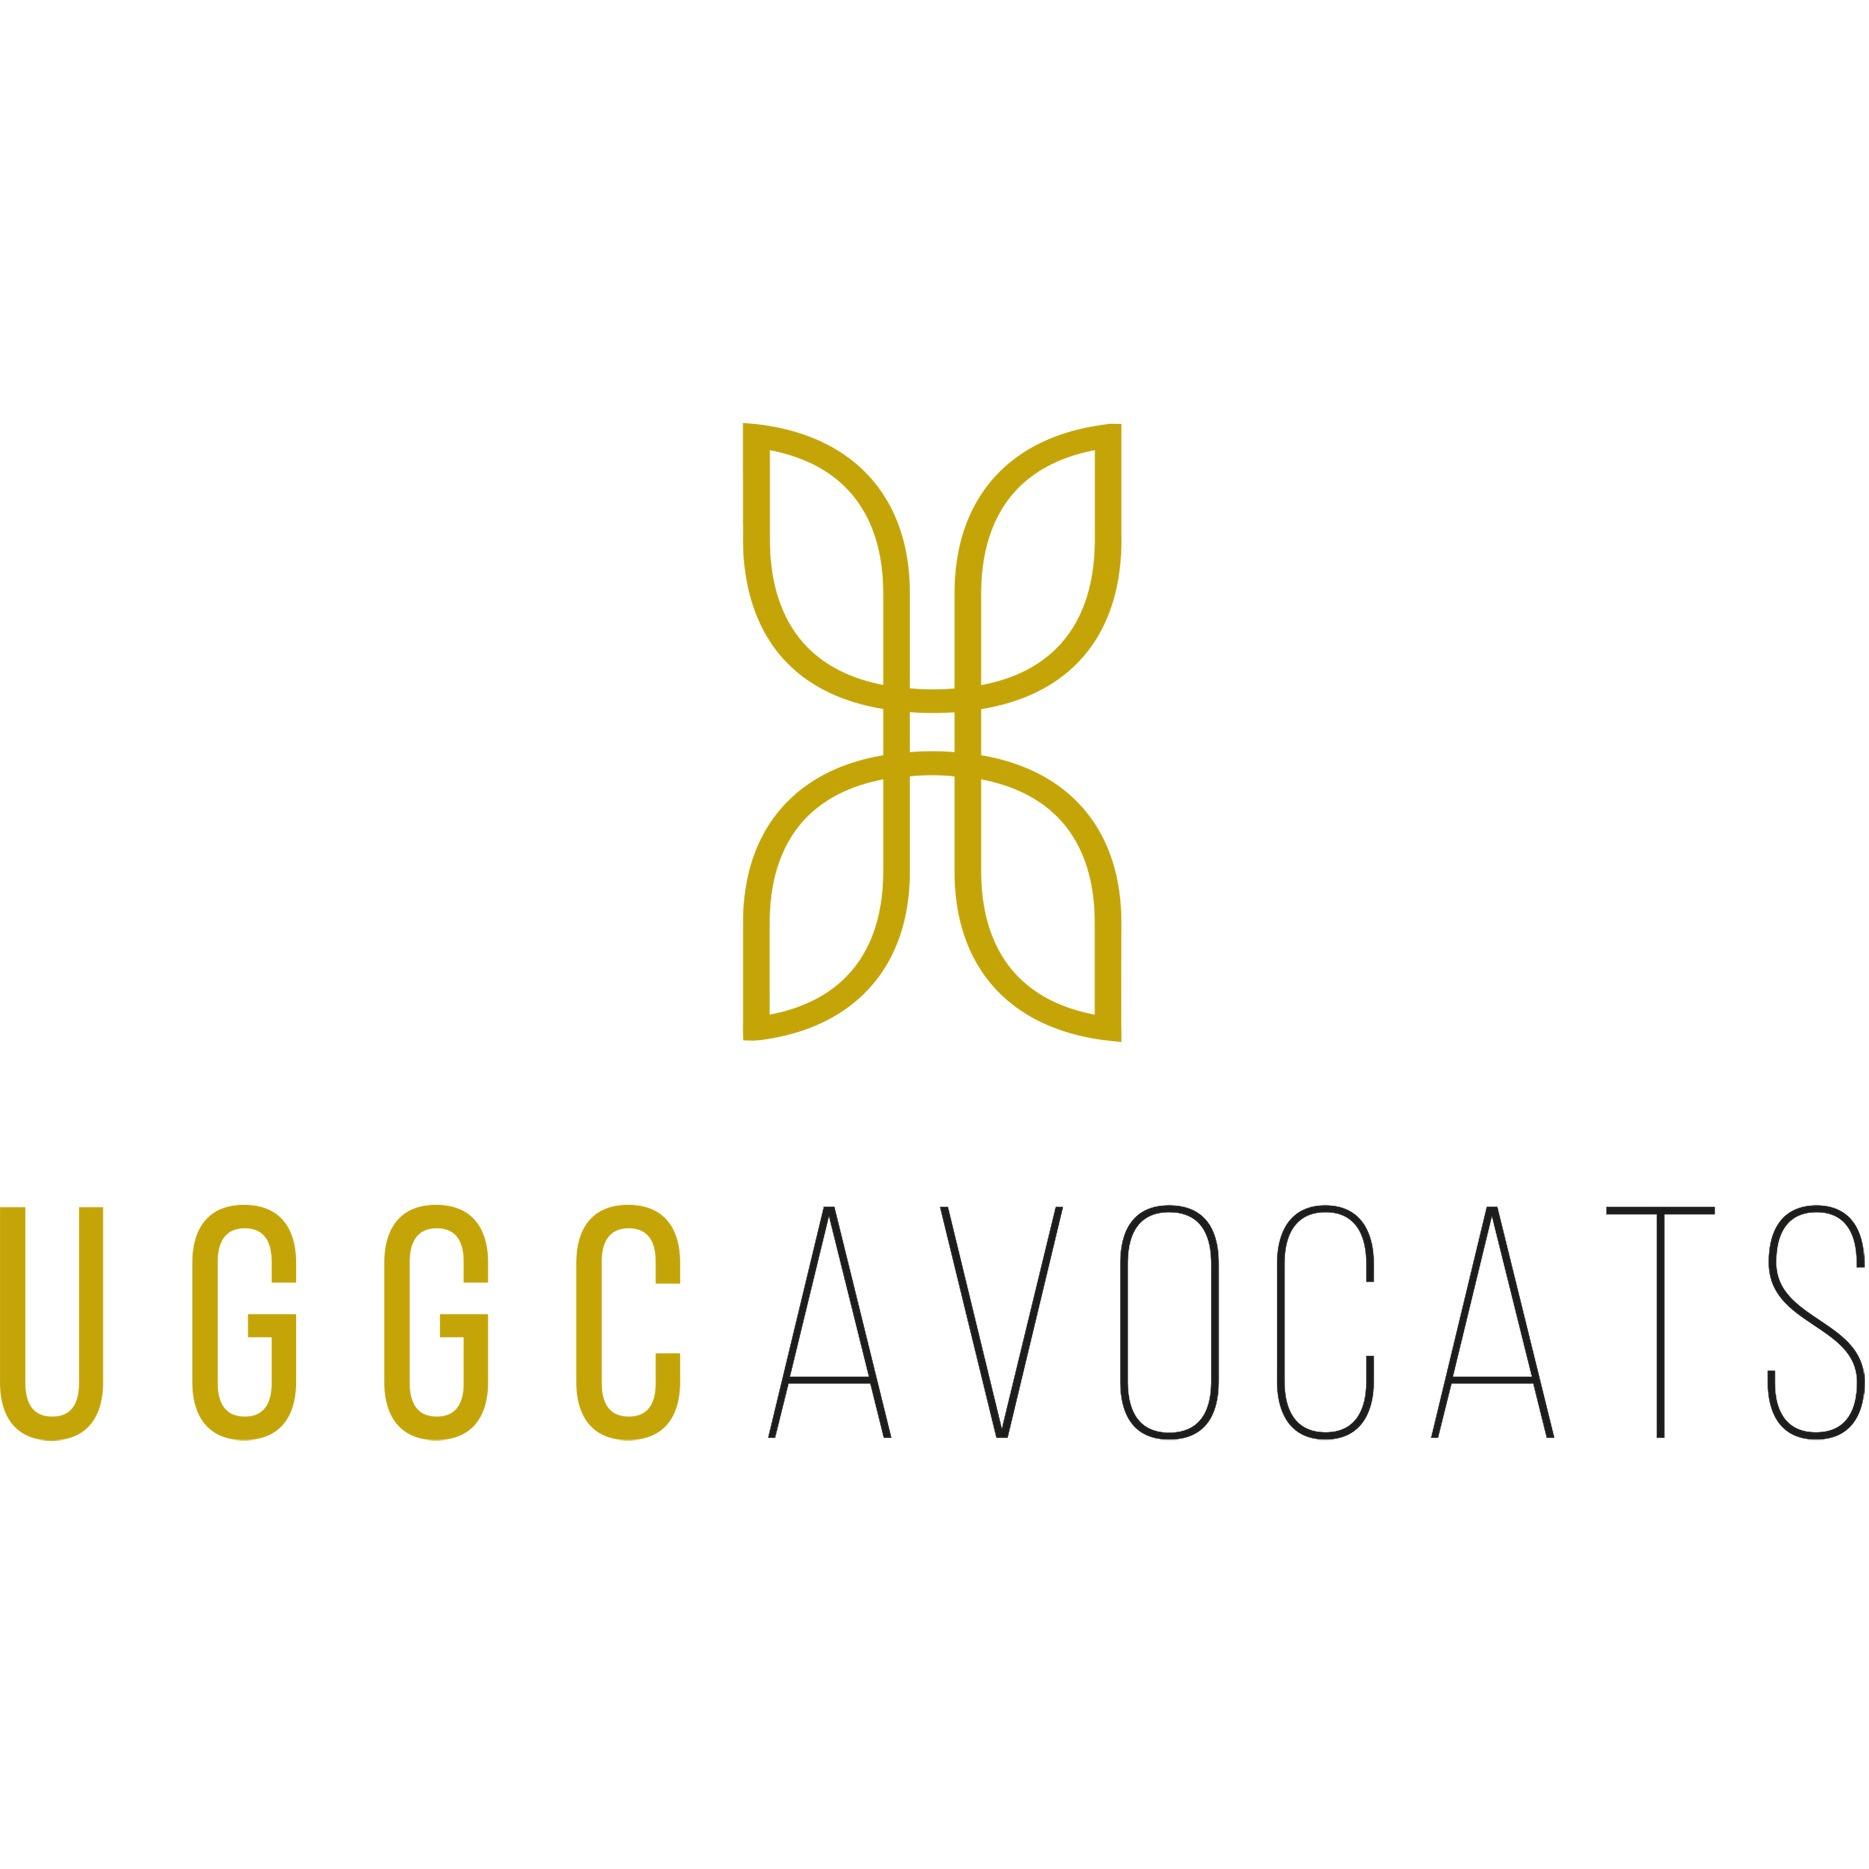 the UGGC Avocats logo.